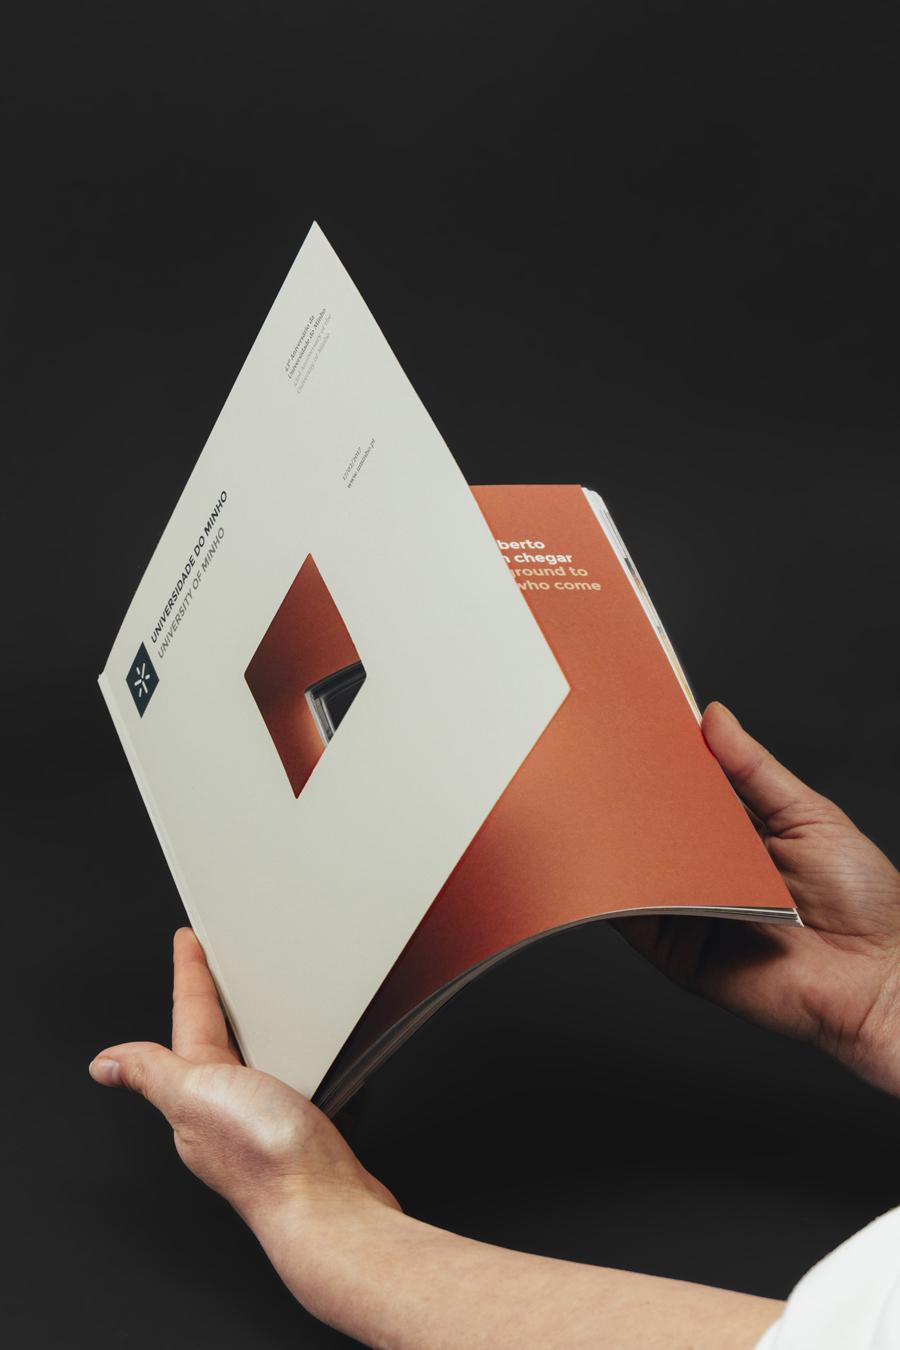 UMinho anniversary magazine by gen design studio